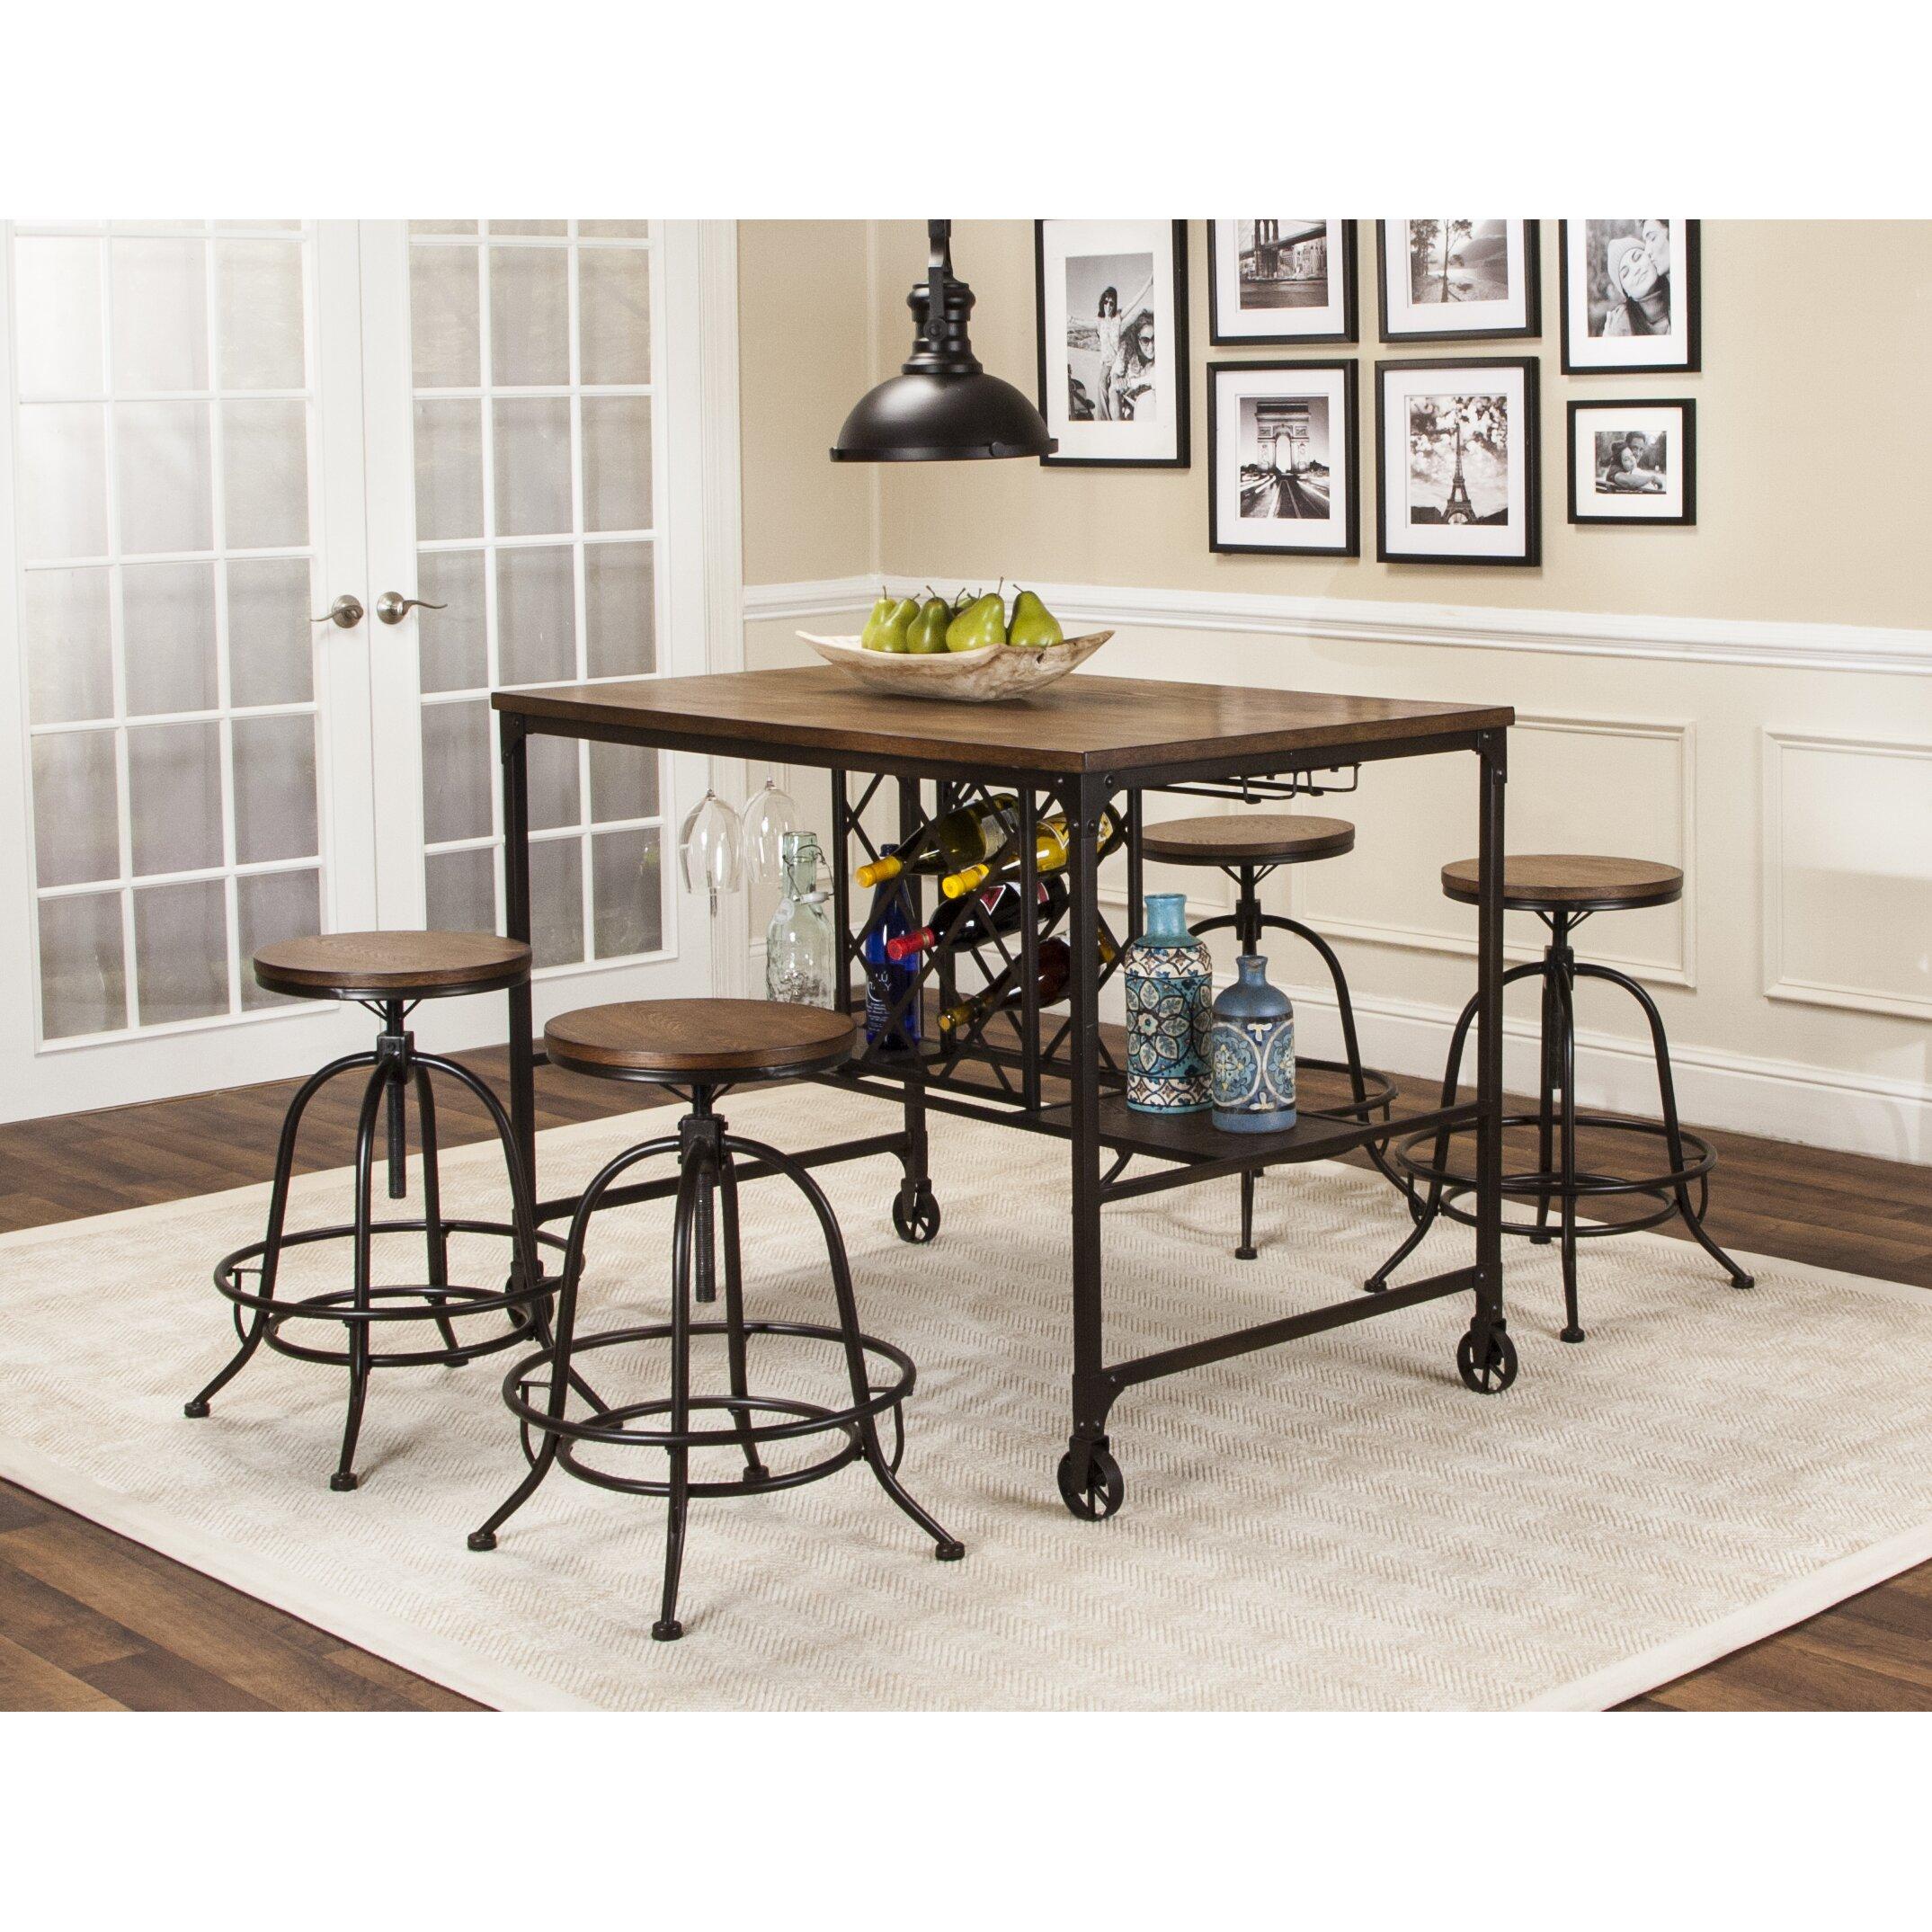 trent austin design cralcum 5 piece pub table set wayfair. Black Bedroom Furniture Sets. Home Design Ideas